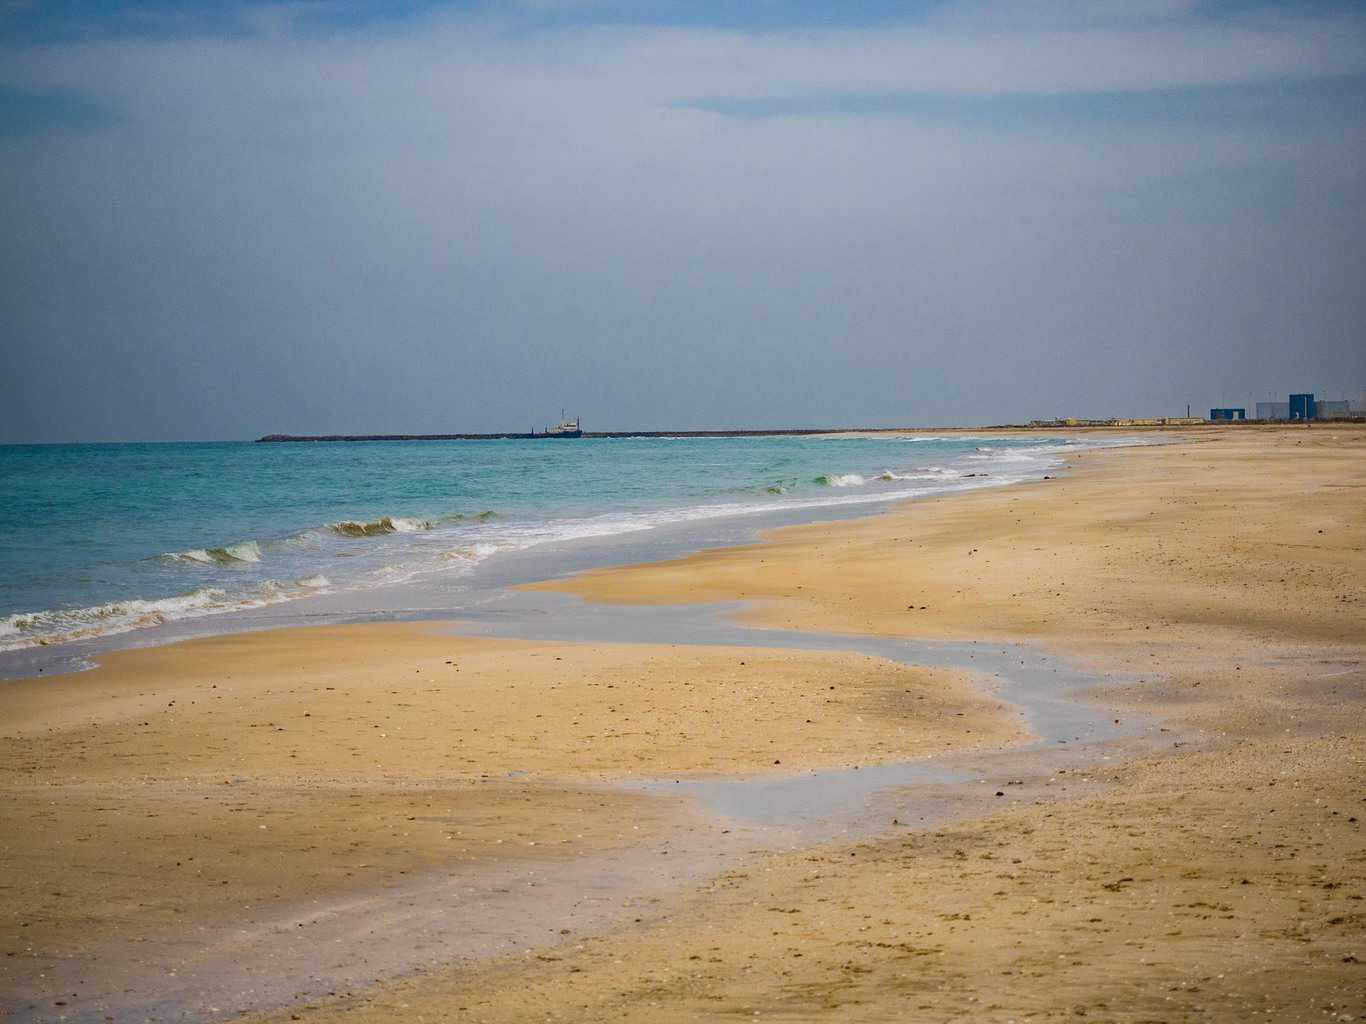 Fish aquarium in umm al quwain - The Beach Just Outside Of The Old Town In Umm Al Quwain